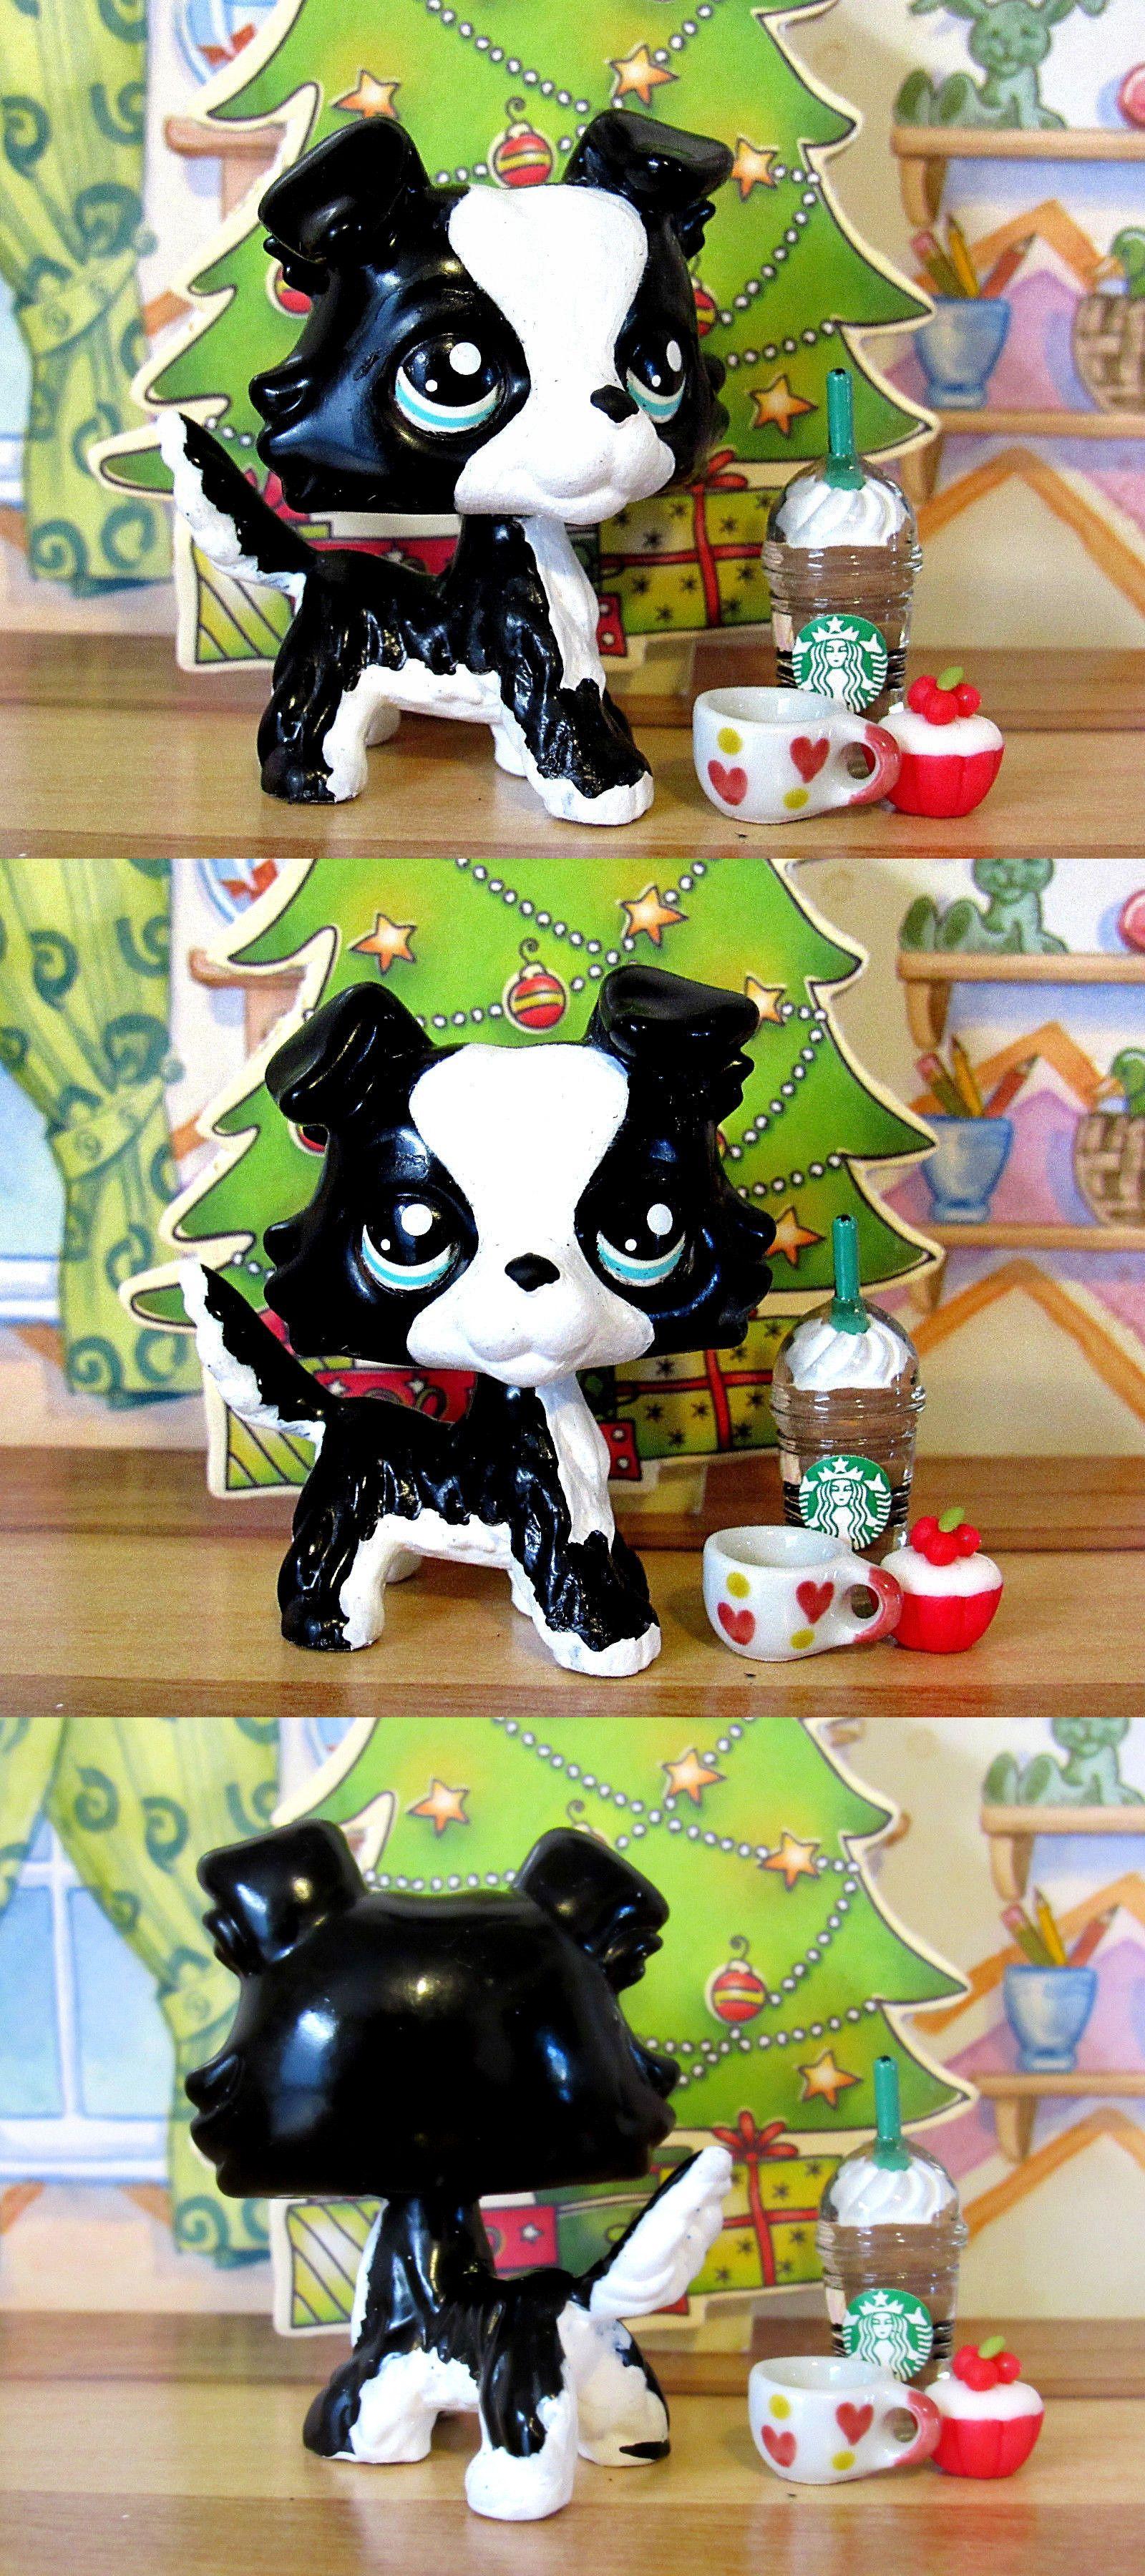 Littlest Pet Shop 150925 Littlest Pet Shop Ooak Border Collie Dog